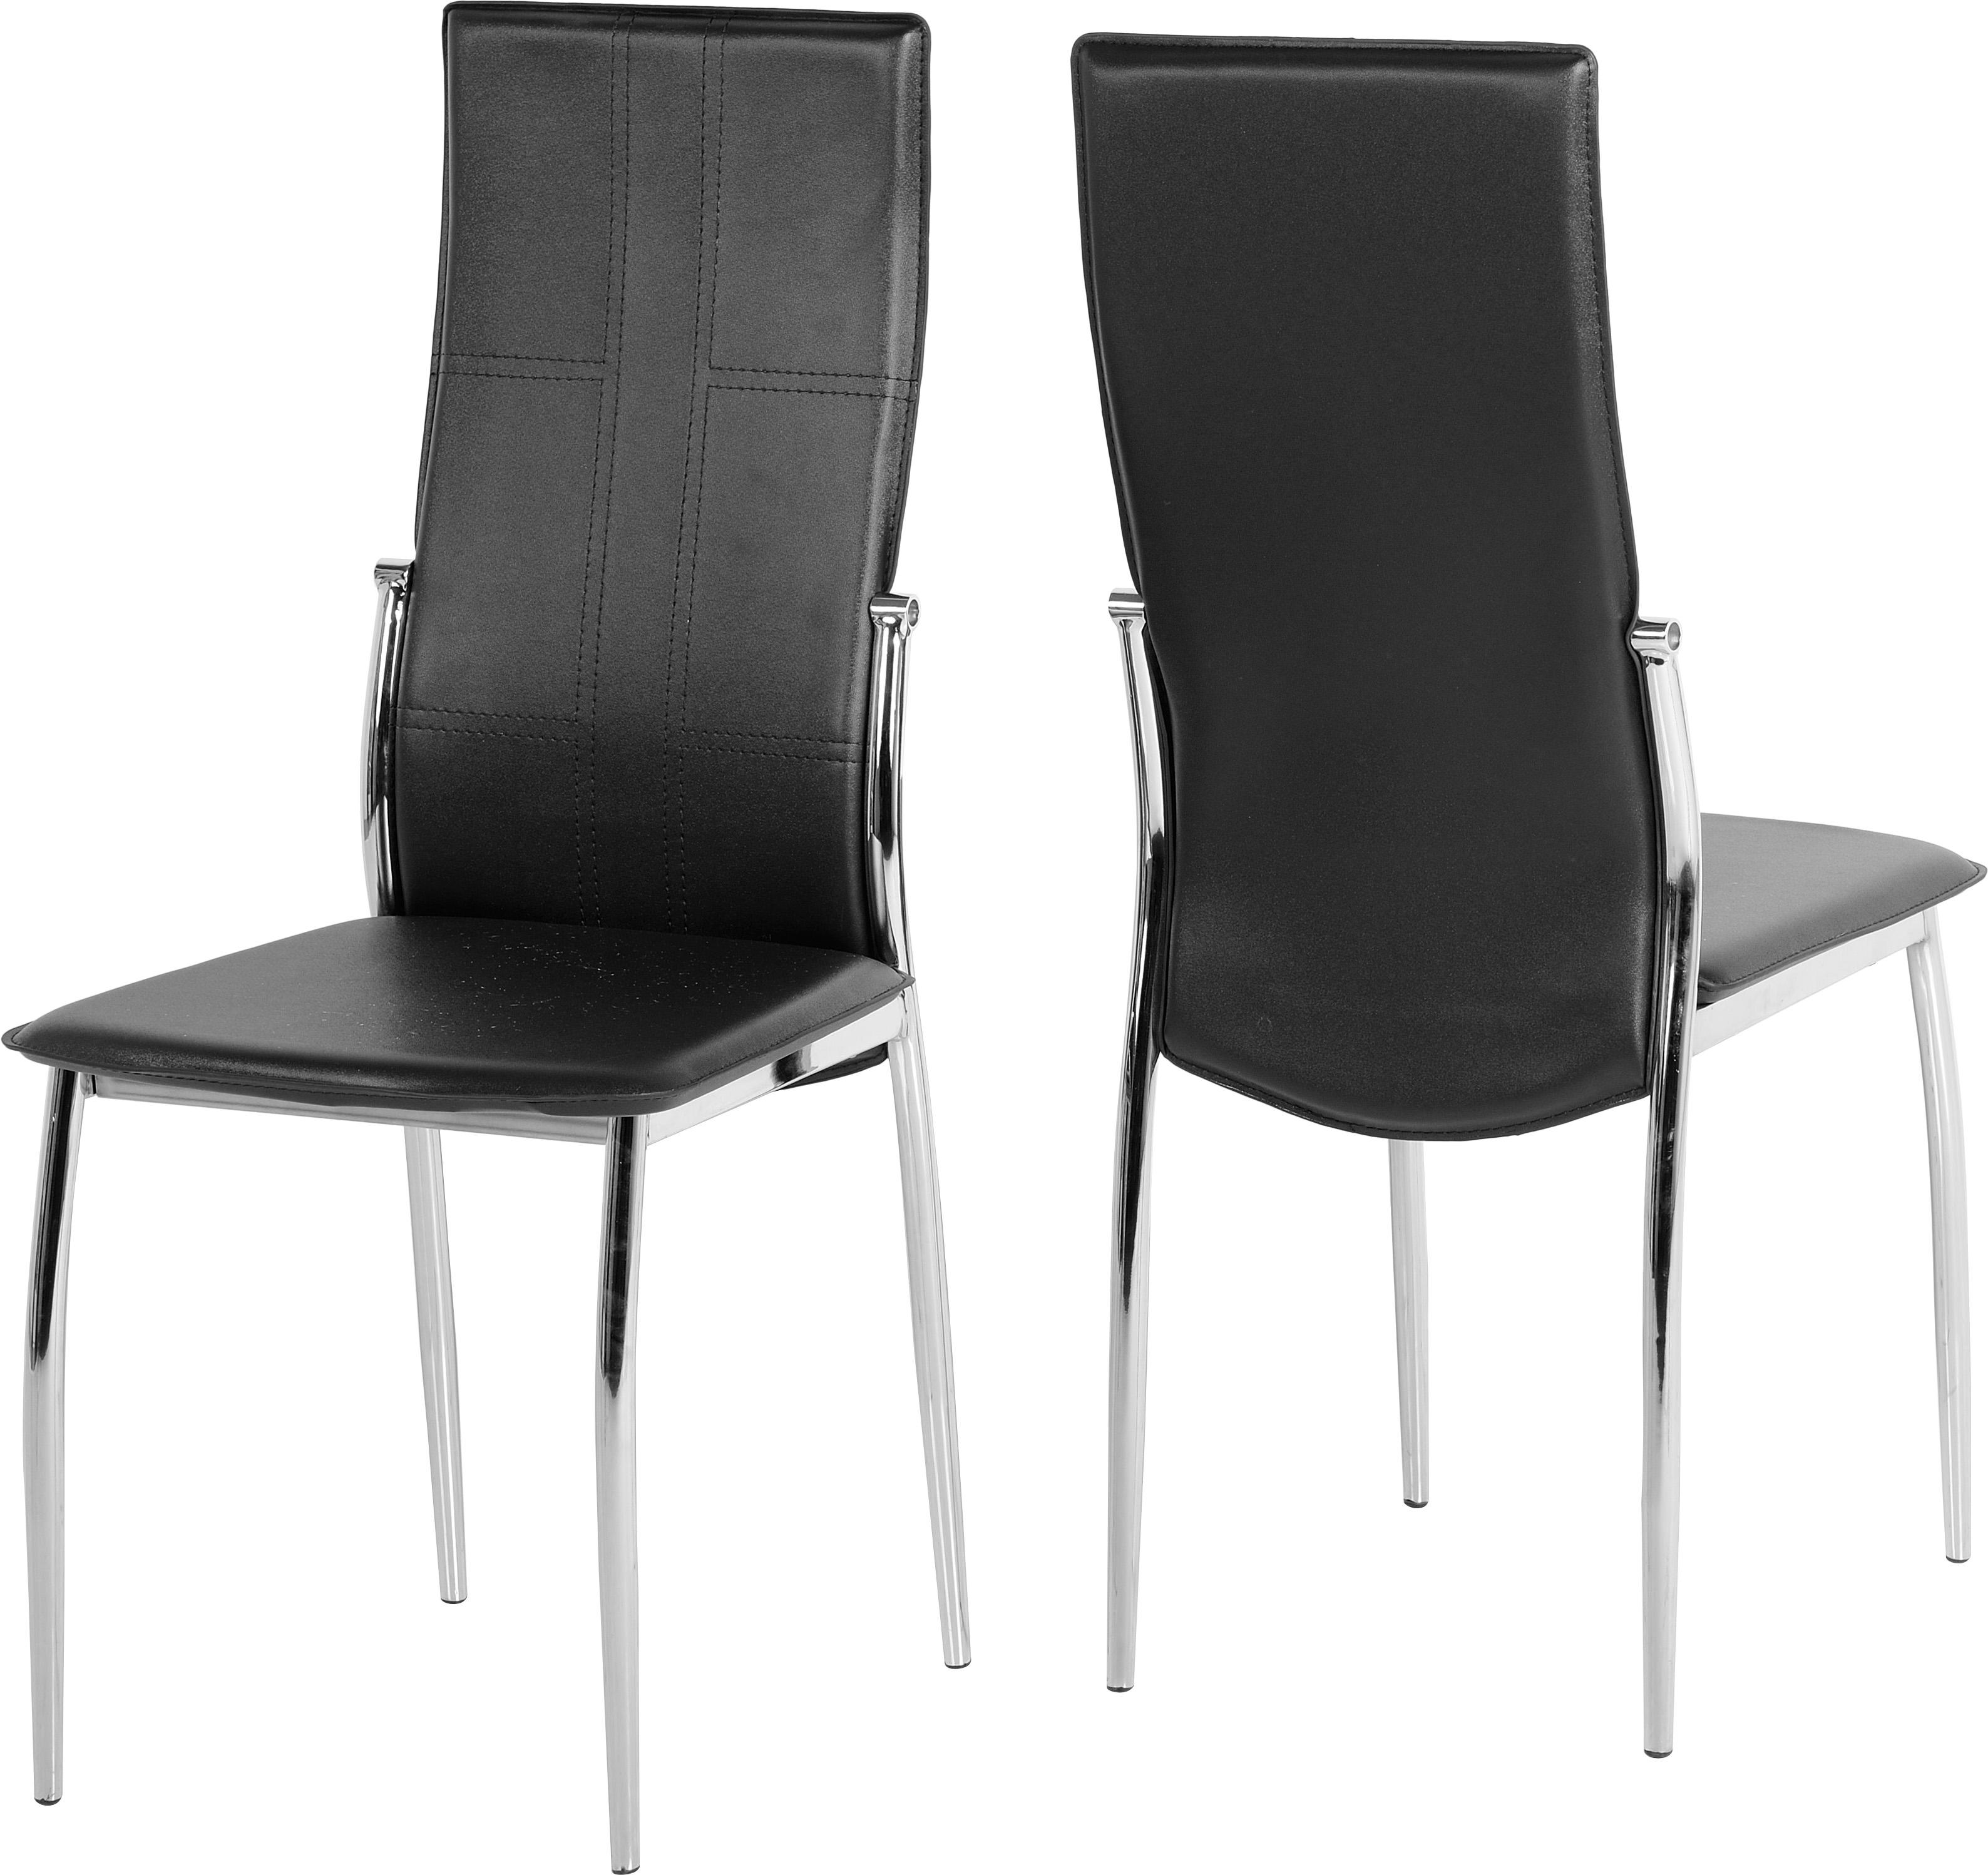 Berkley Chairs Black